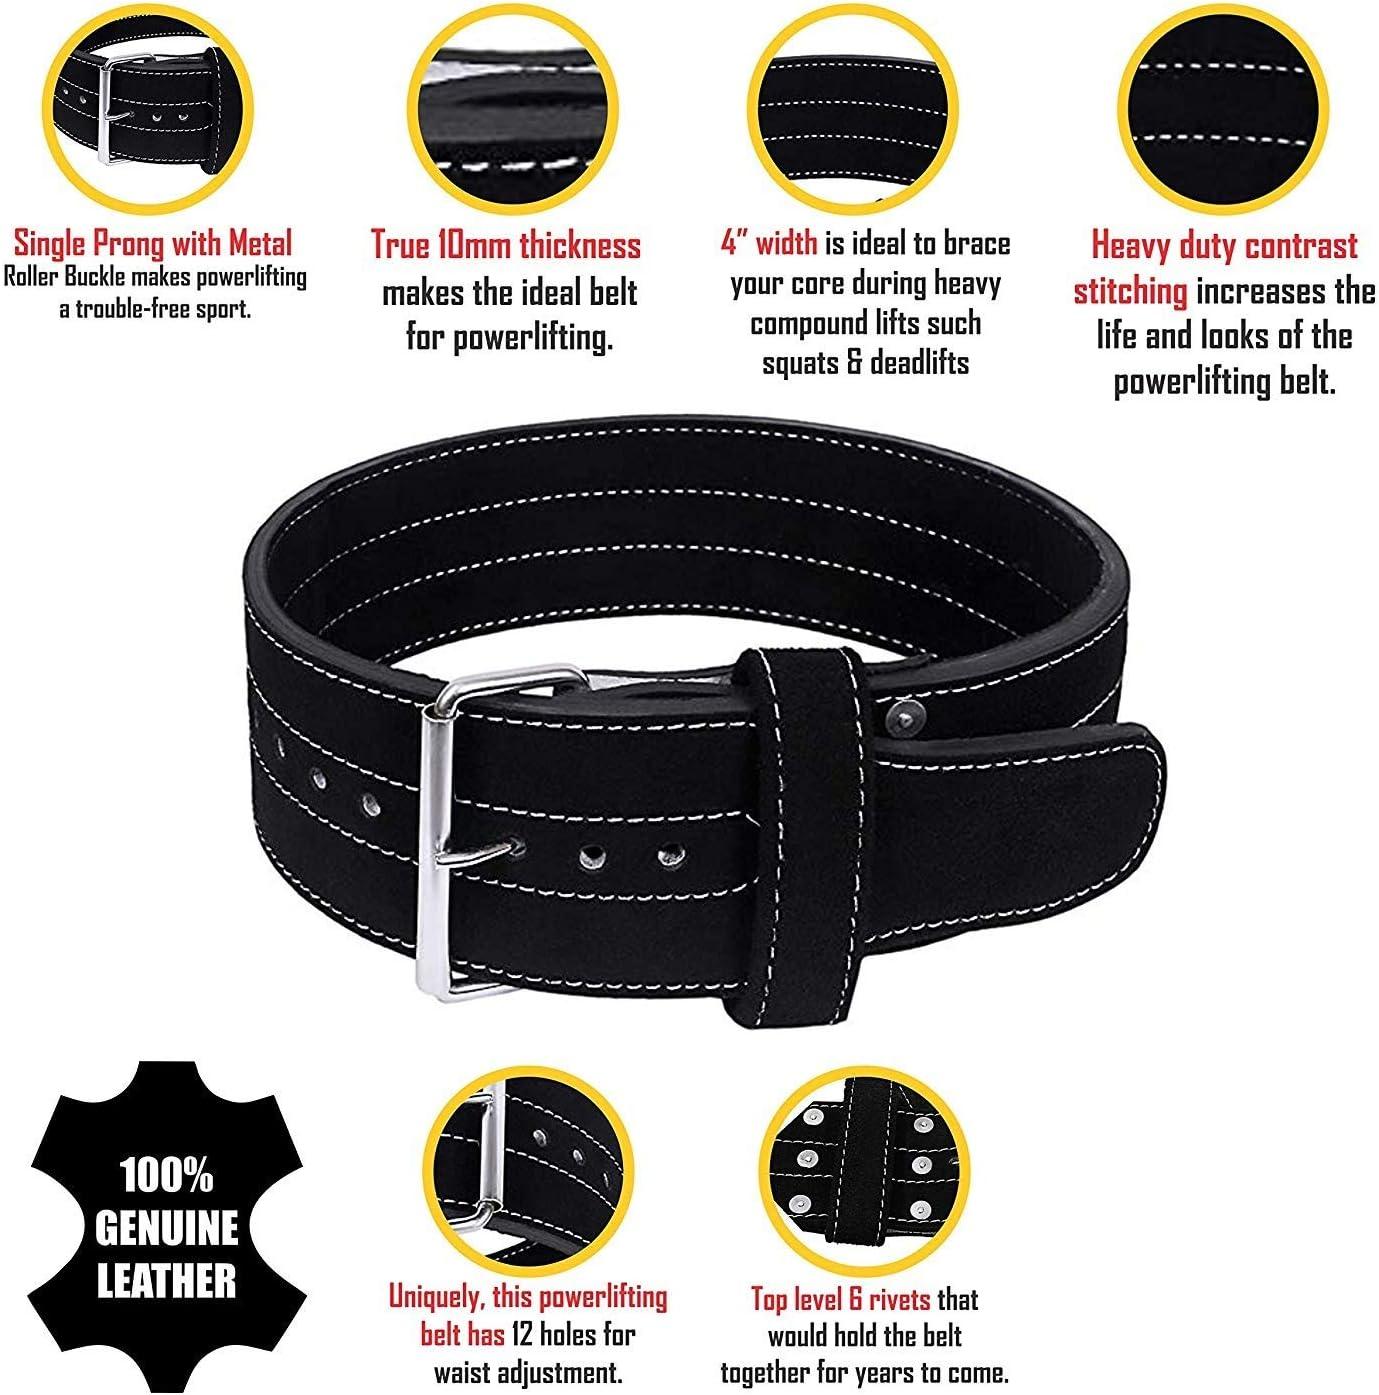 Condor Fitness Lever Belt Black Genuine Leather Powerlifting Men /& Women Power Lifting Buckle 10mm Weightlifting Belt